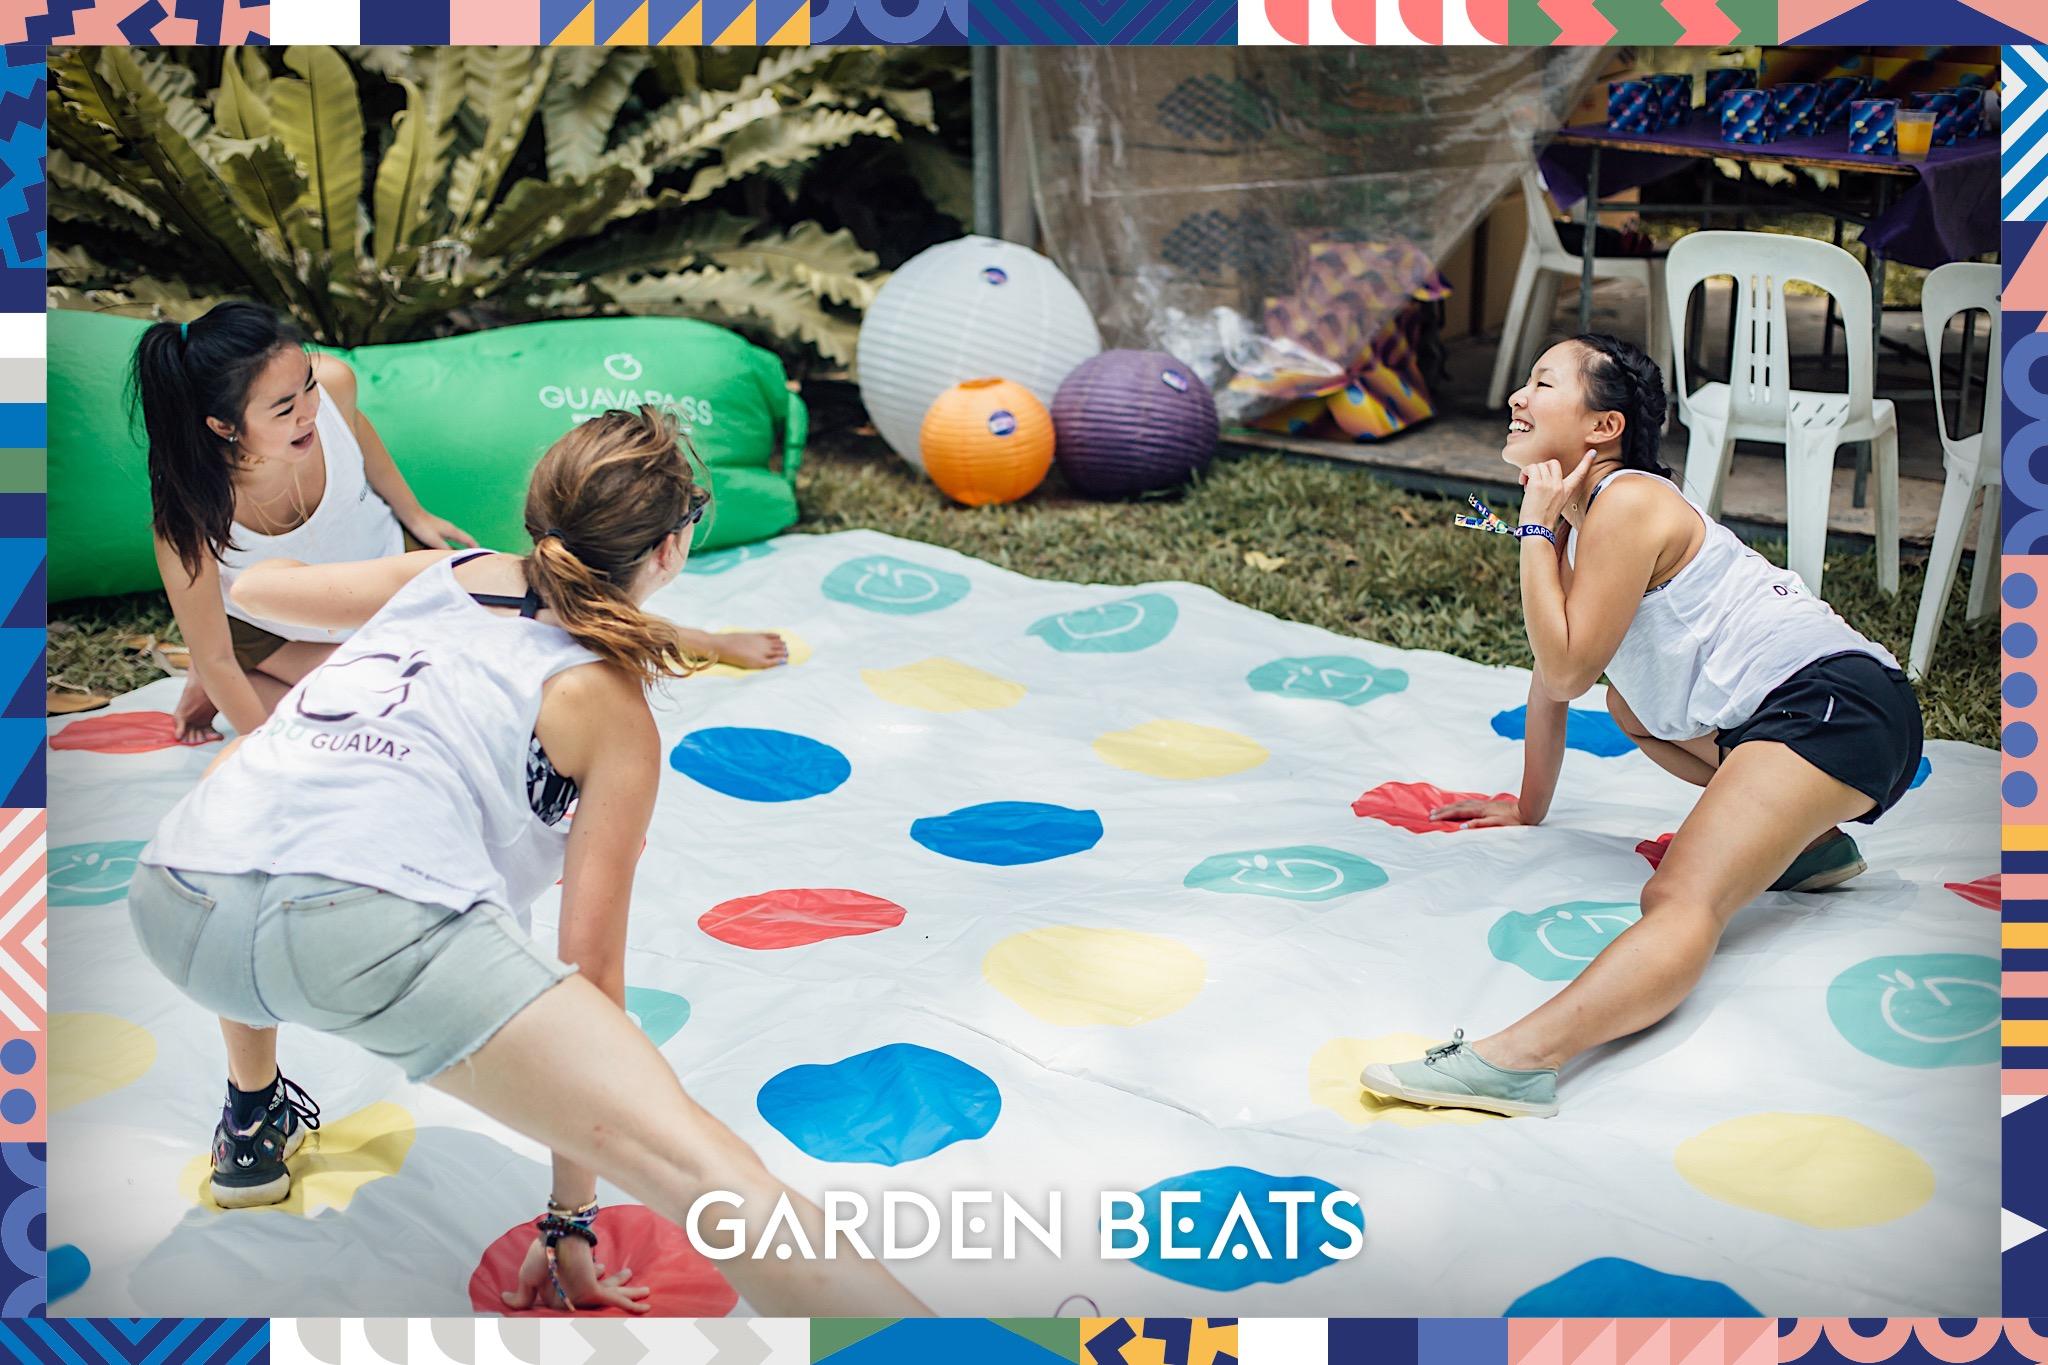 18032017_GardenBeats_Colossal162_WatermarkedGB.jpg